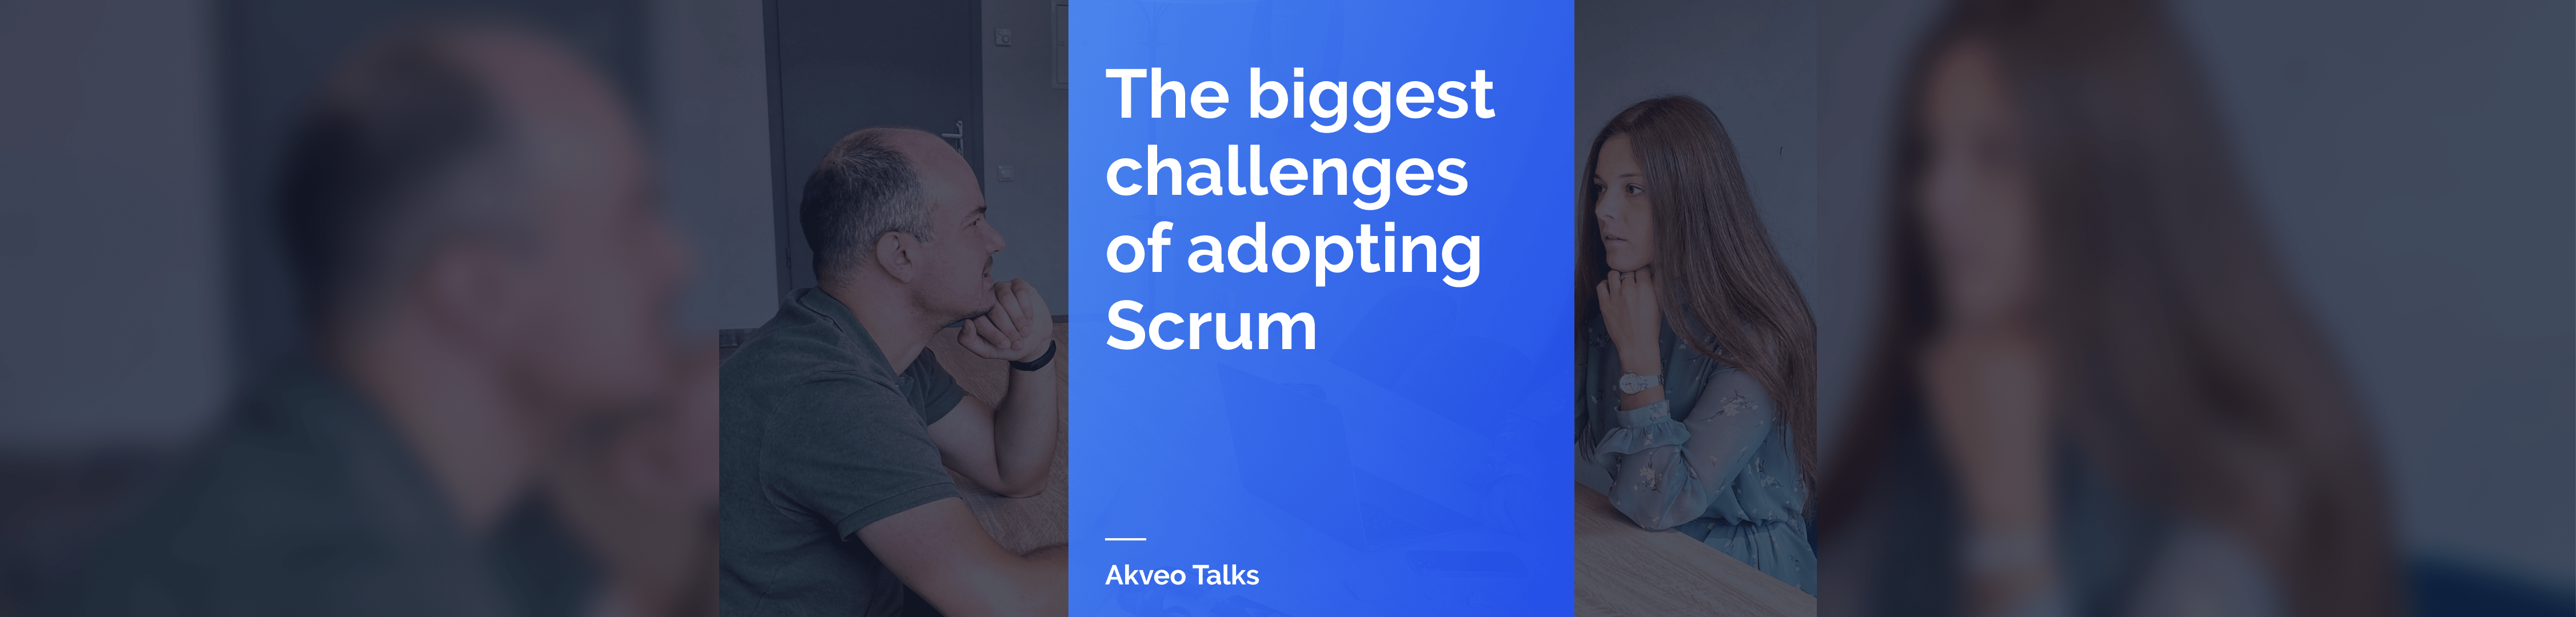 Akveo Talks: the biggest challenges of adopting Scrum